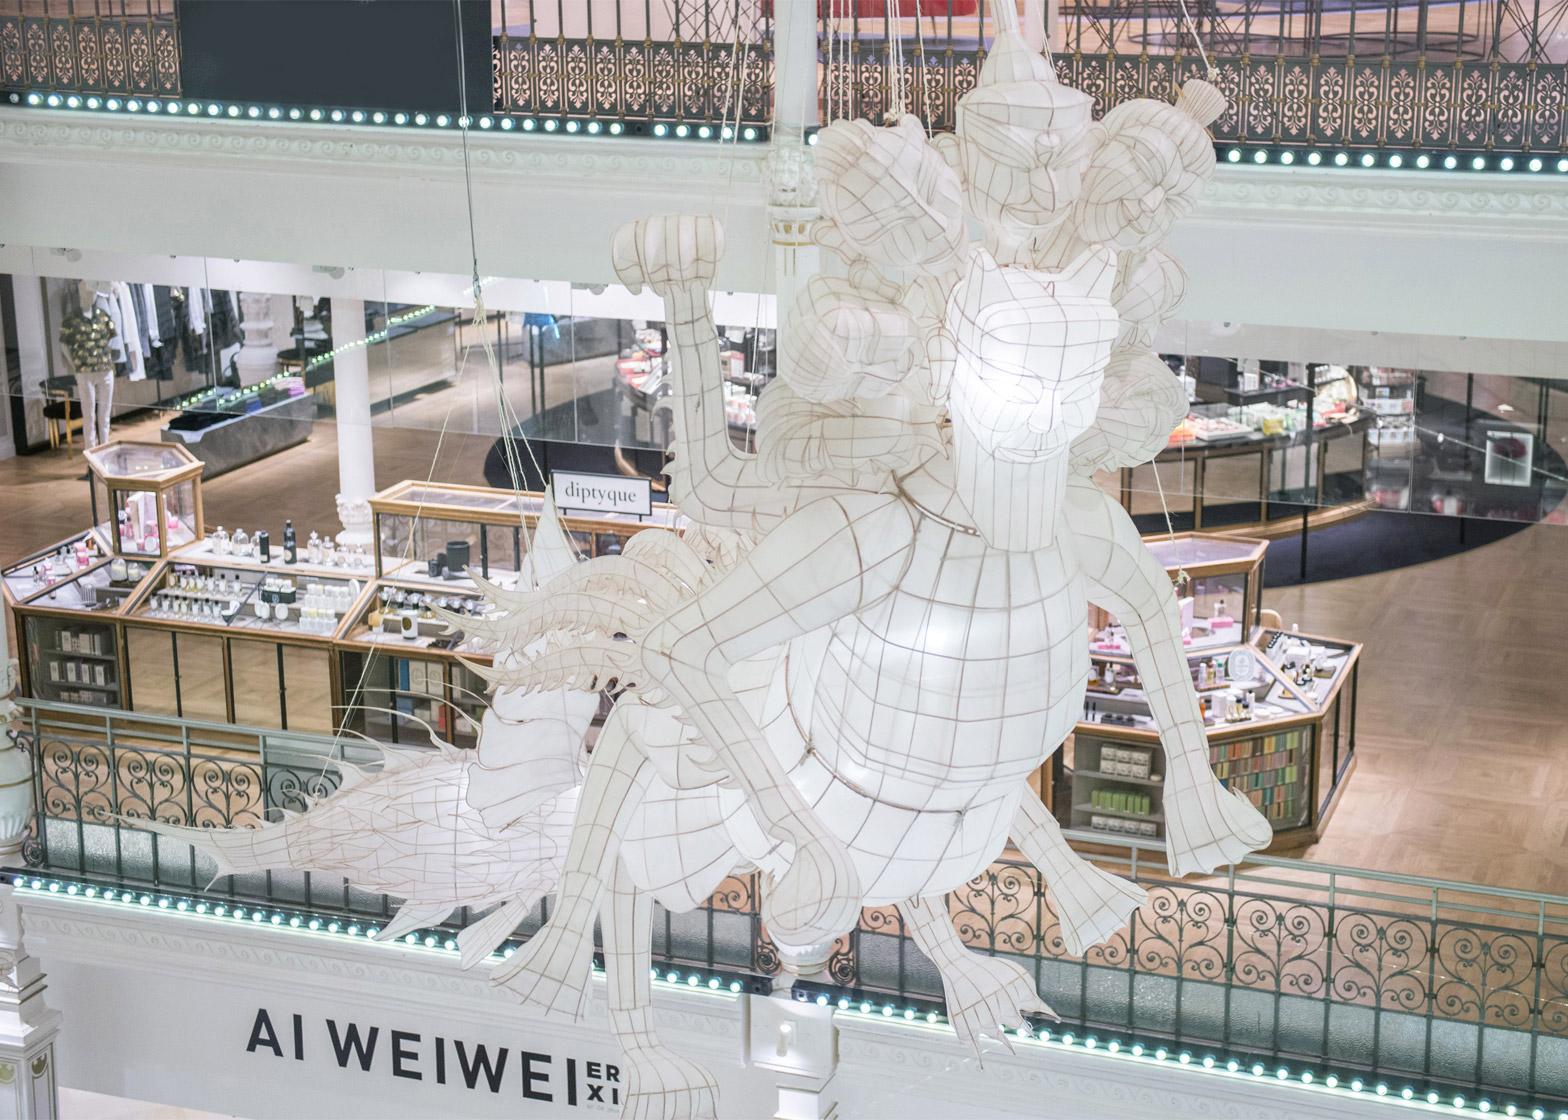 ai-wei-wei-er-xi-exhibition-le-bon-marche-2016_dezeen_1568_5.jpg